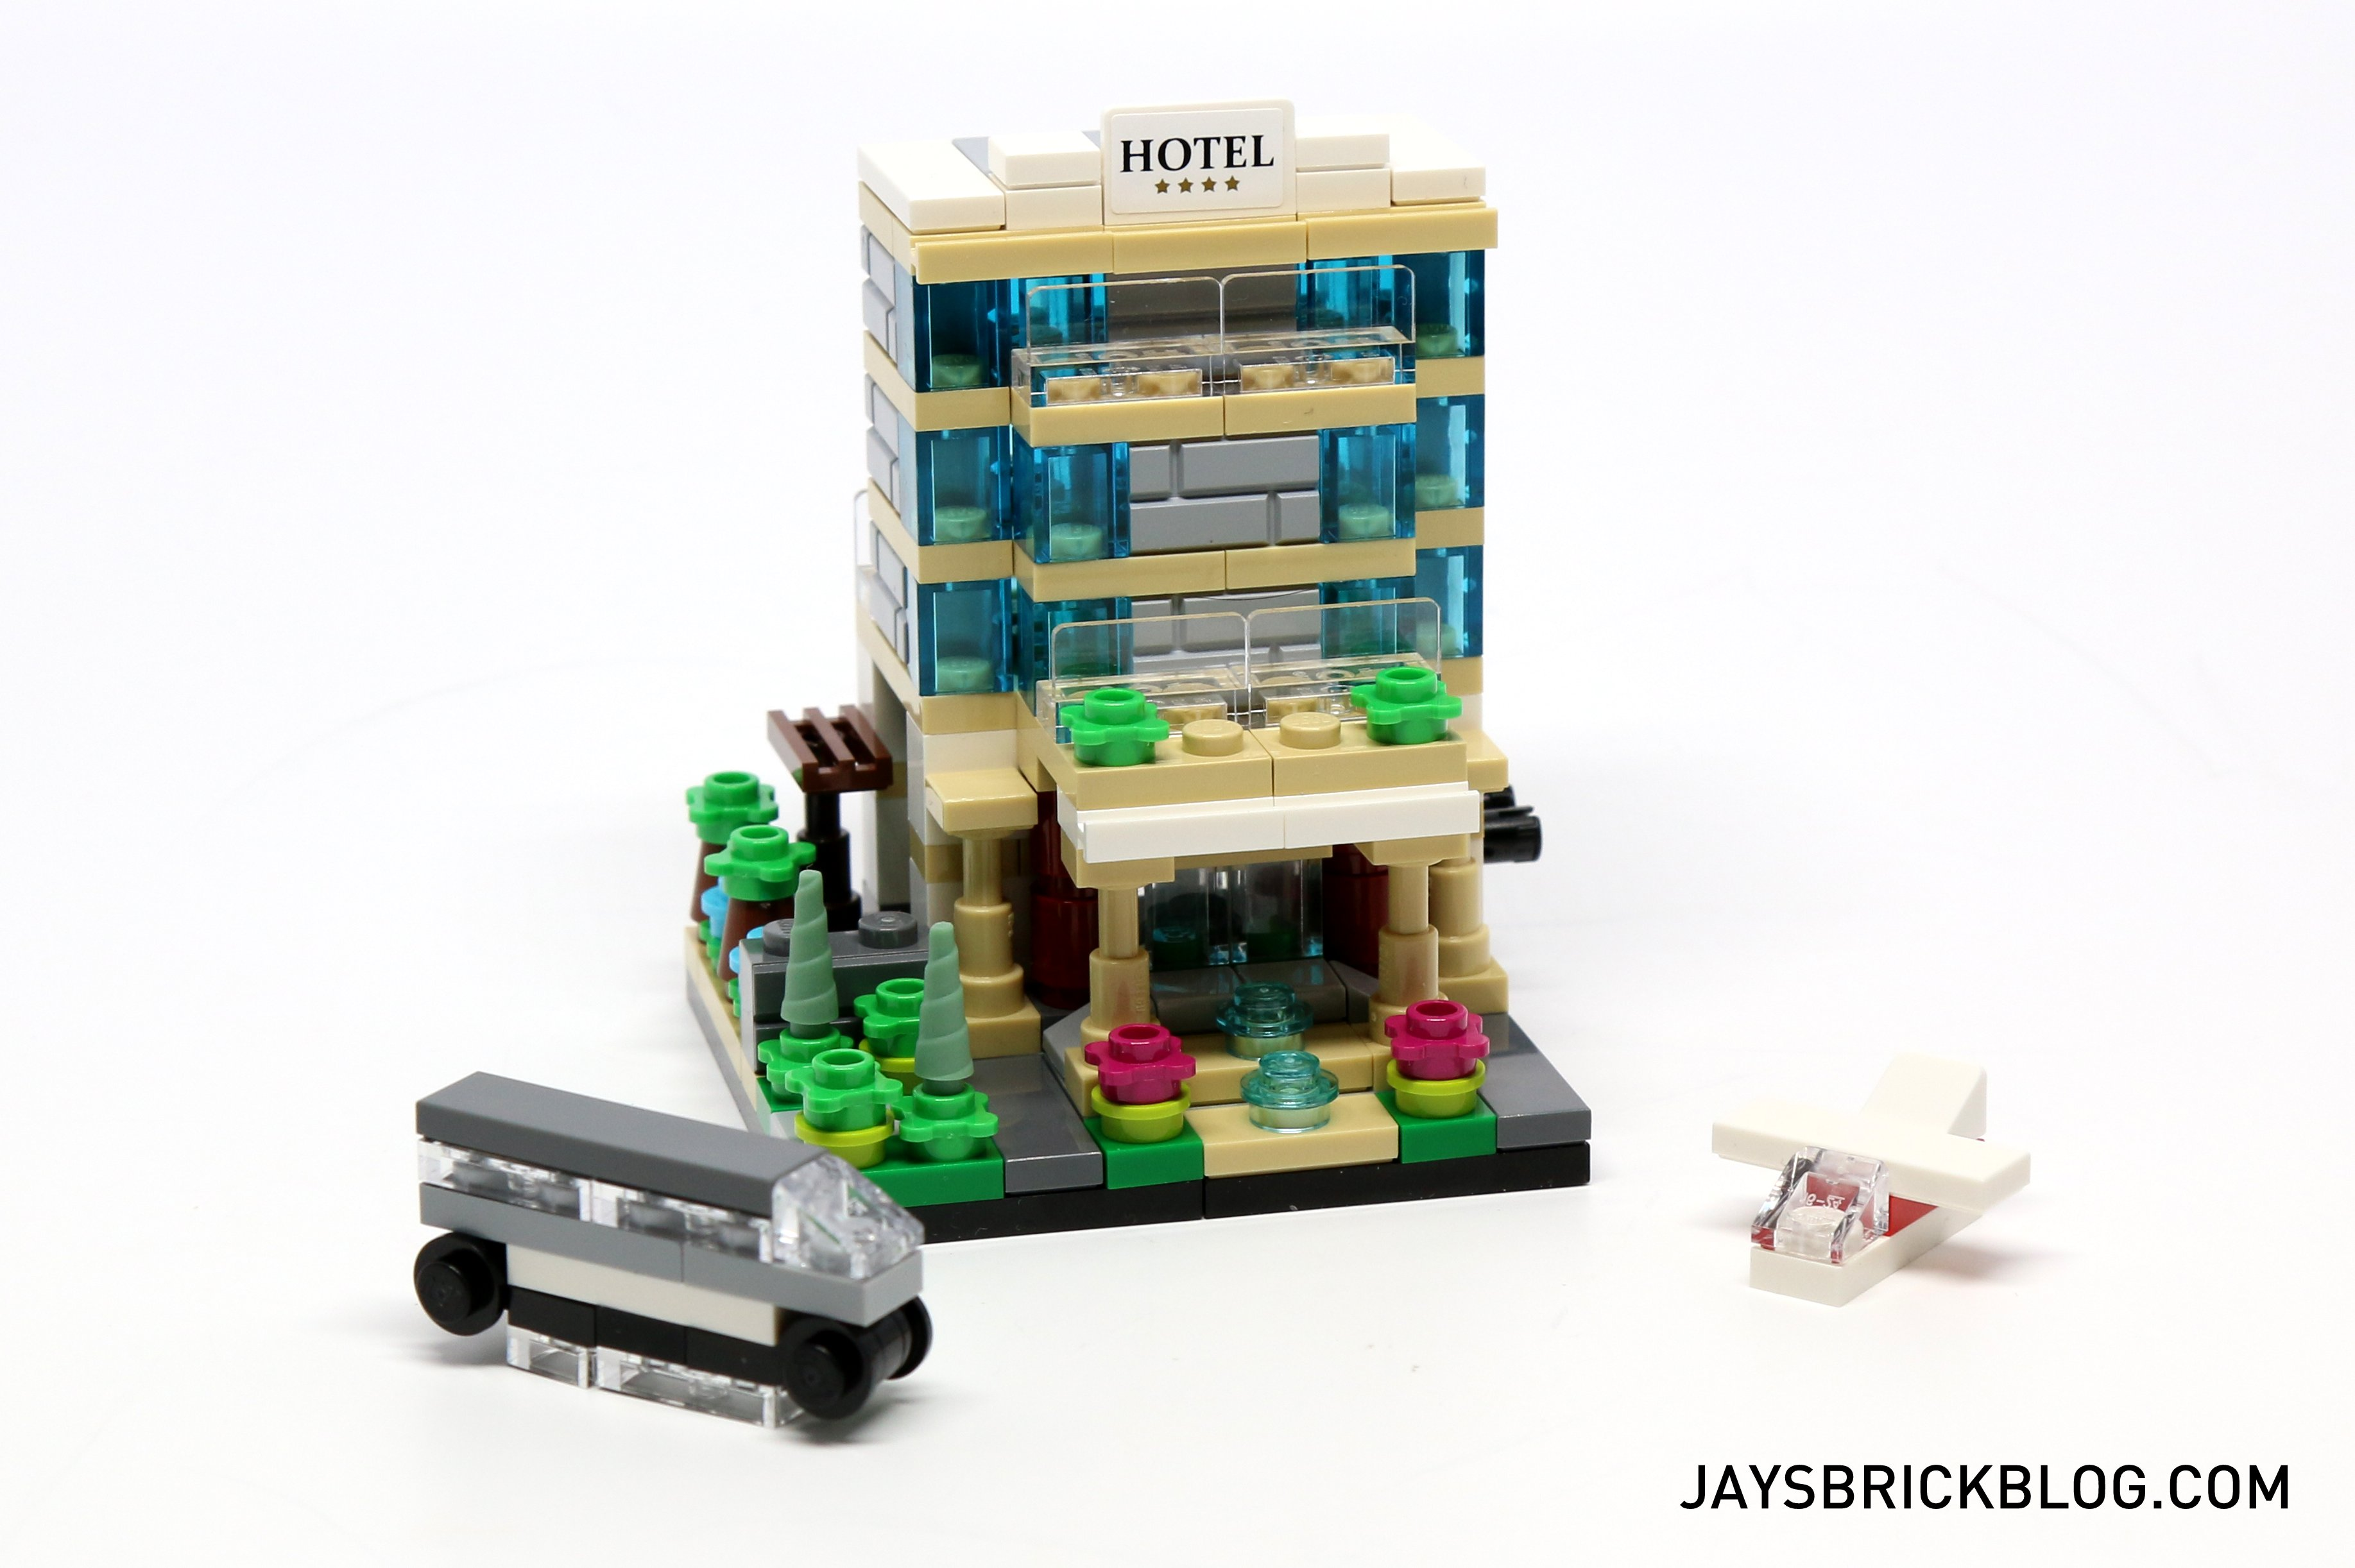 lego tru bricktober 2015 hotel